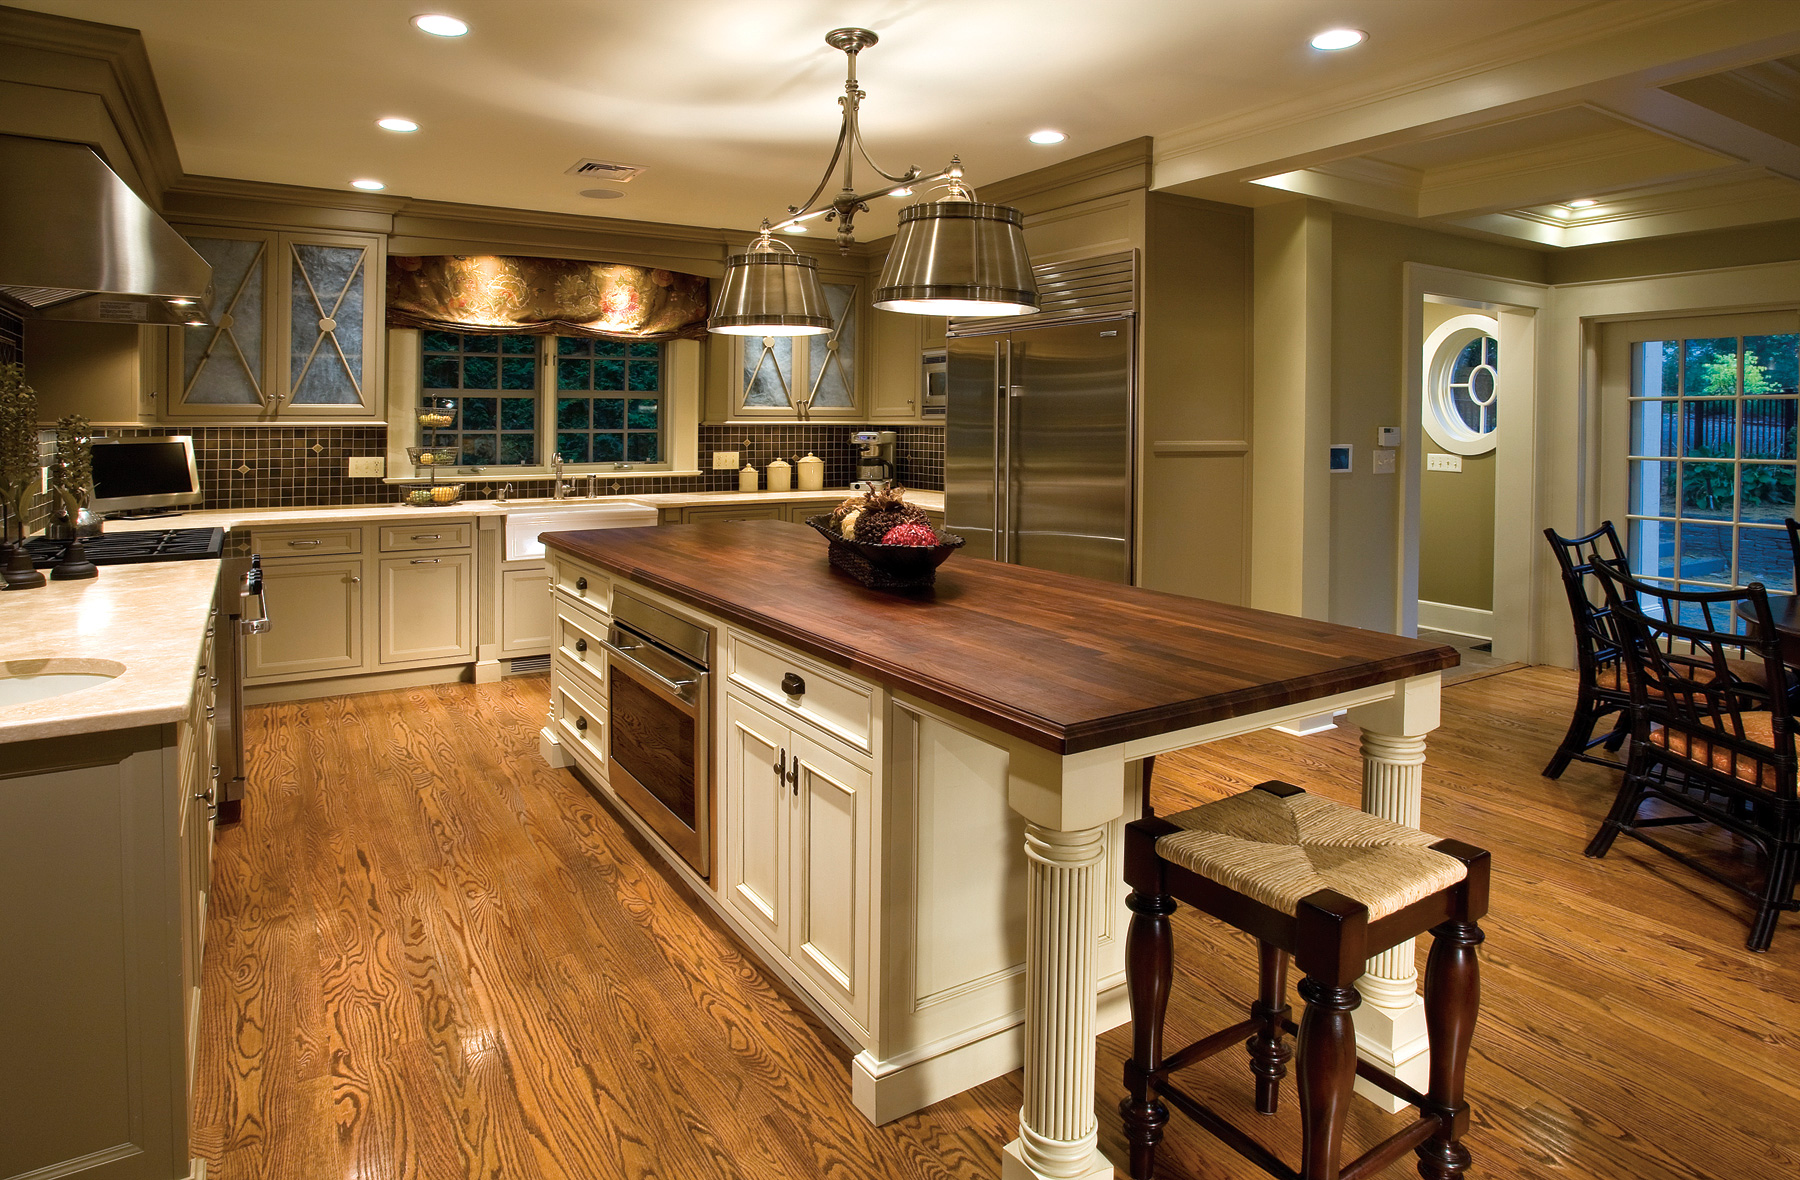 Fullsize Of Country Kitchen Island Ideas